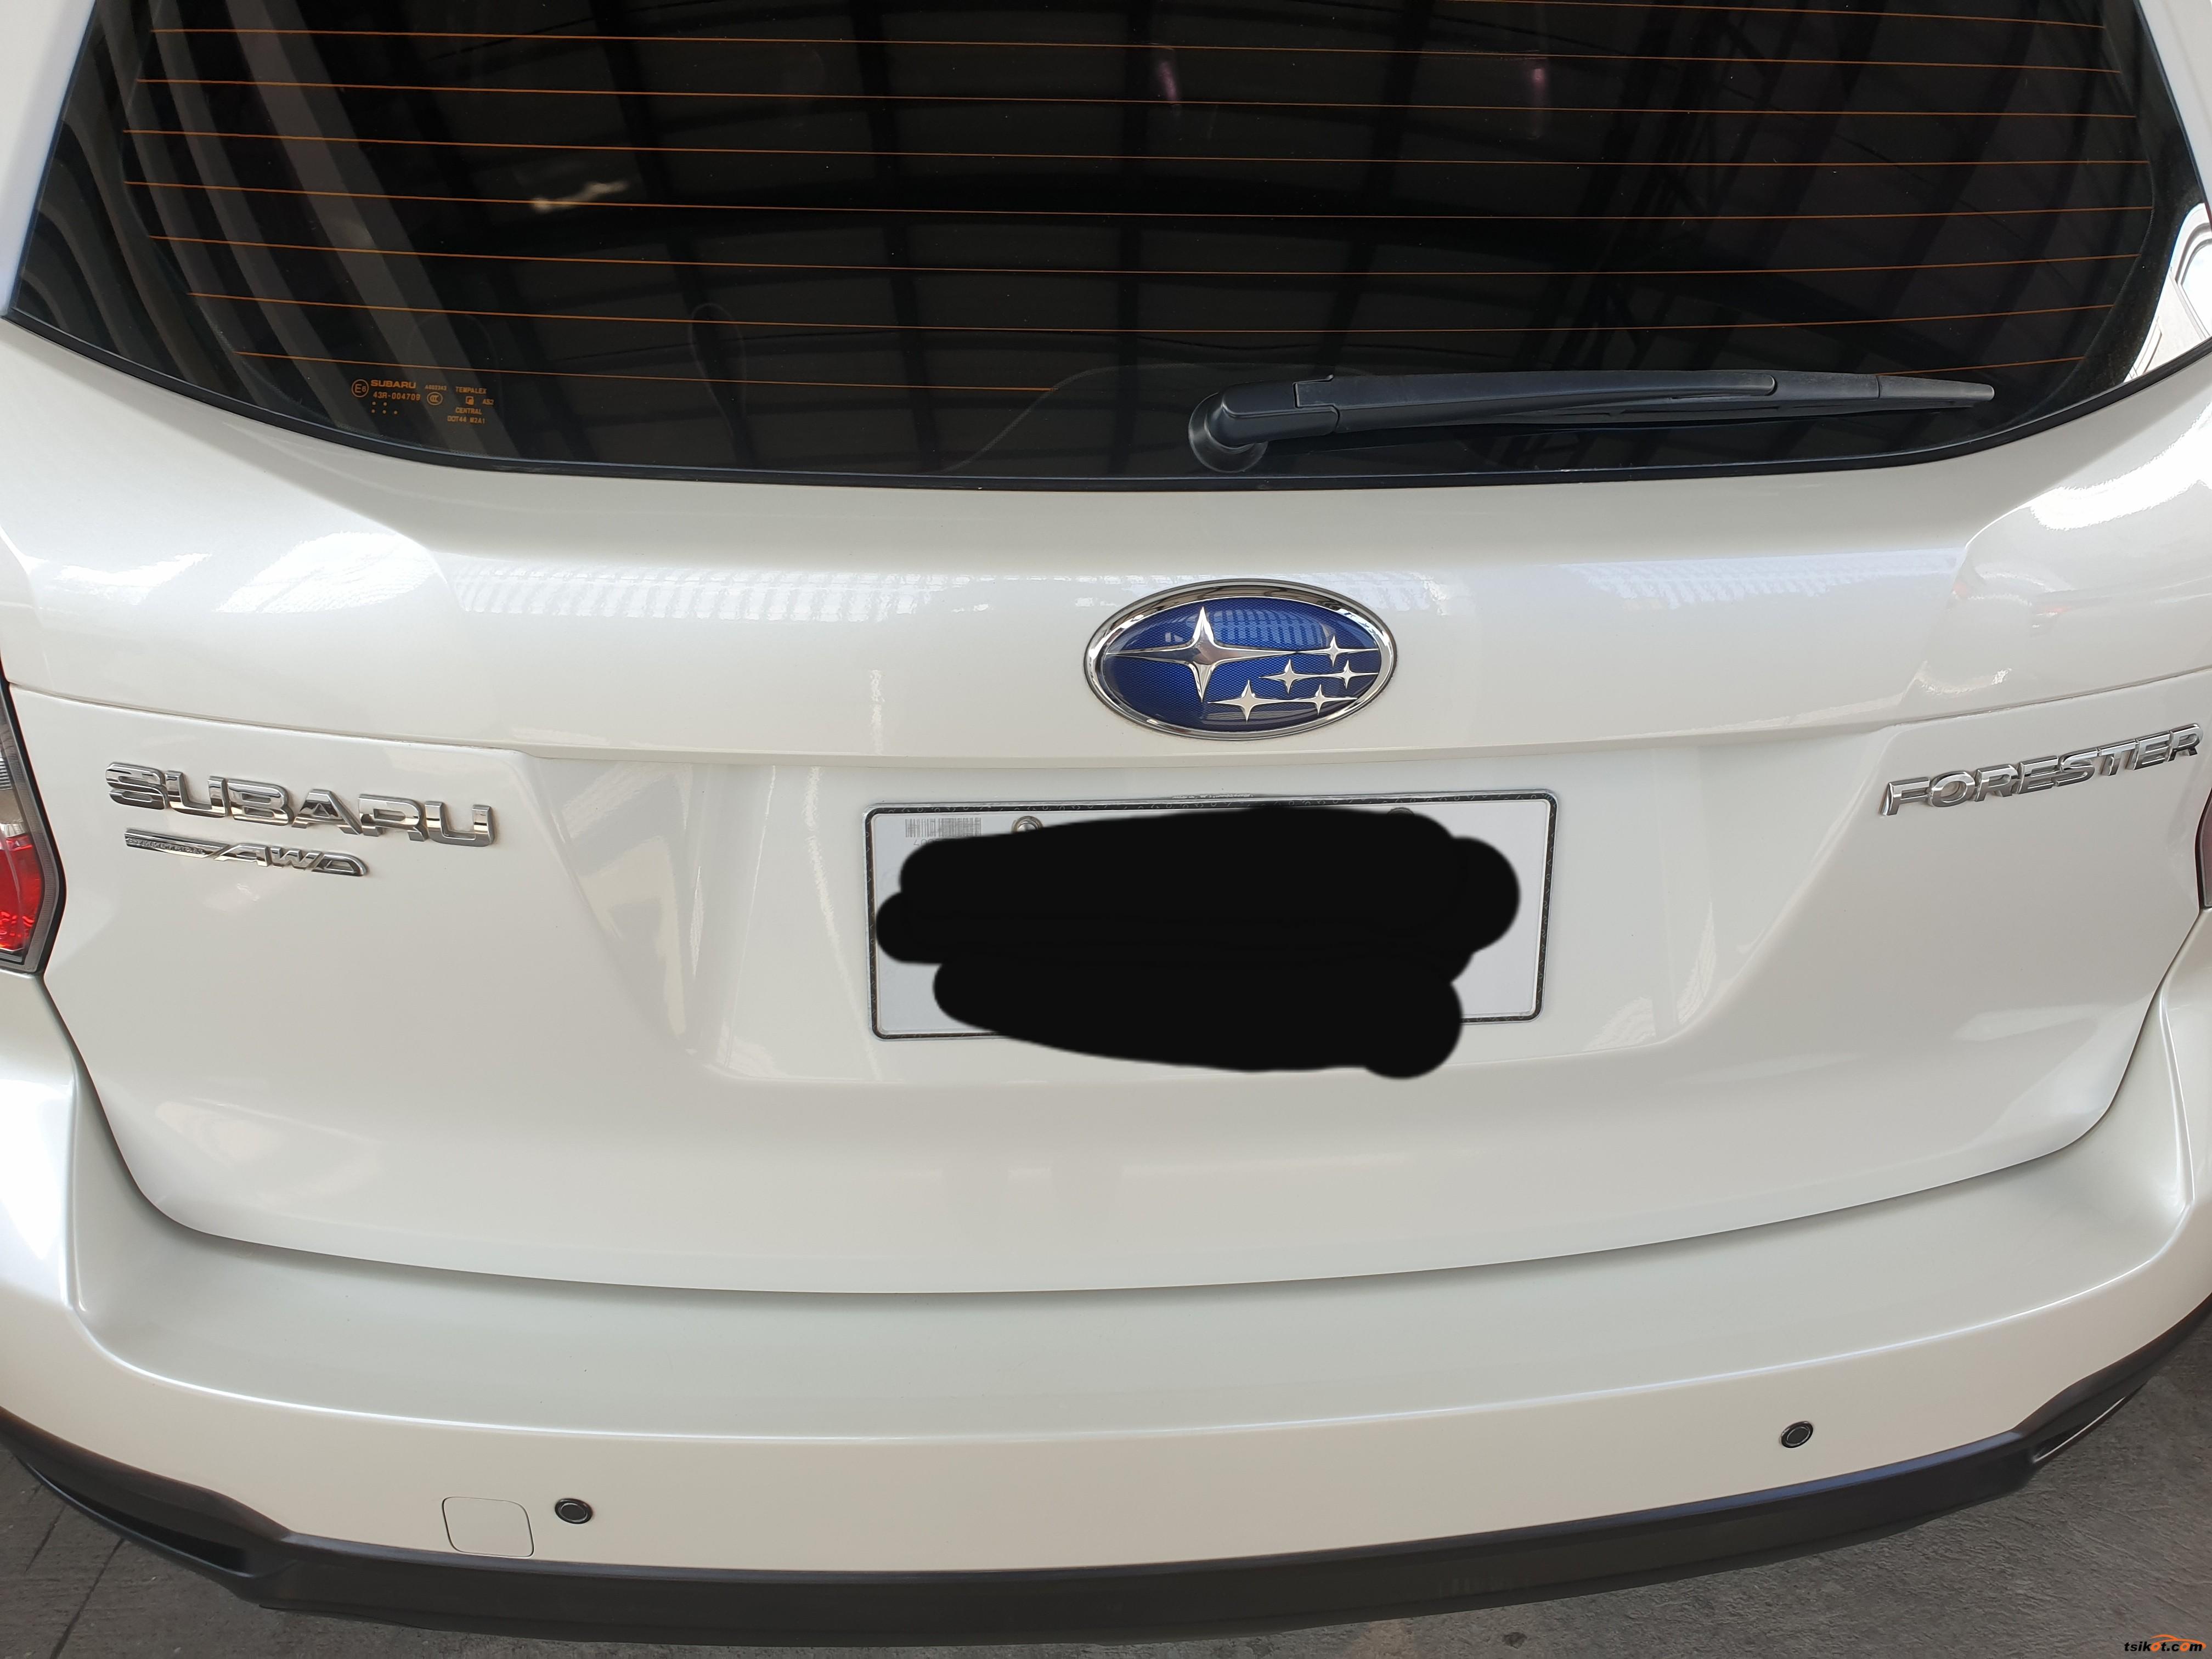 Subaru Forester 2014 - 8